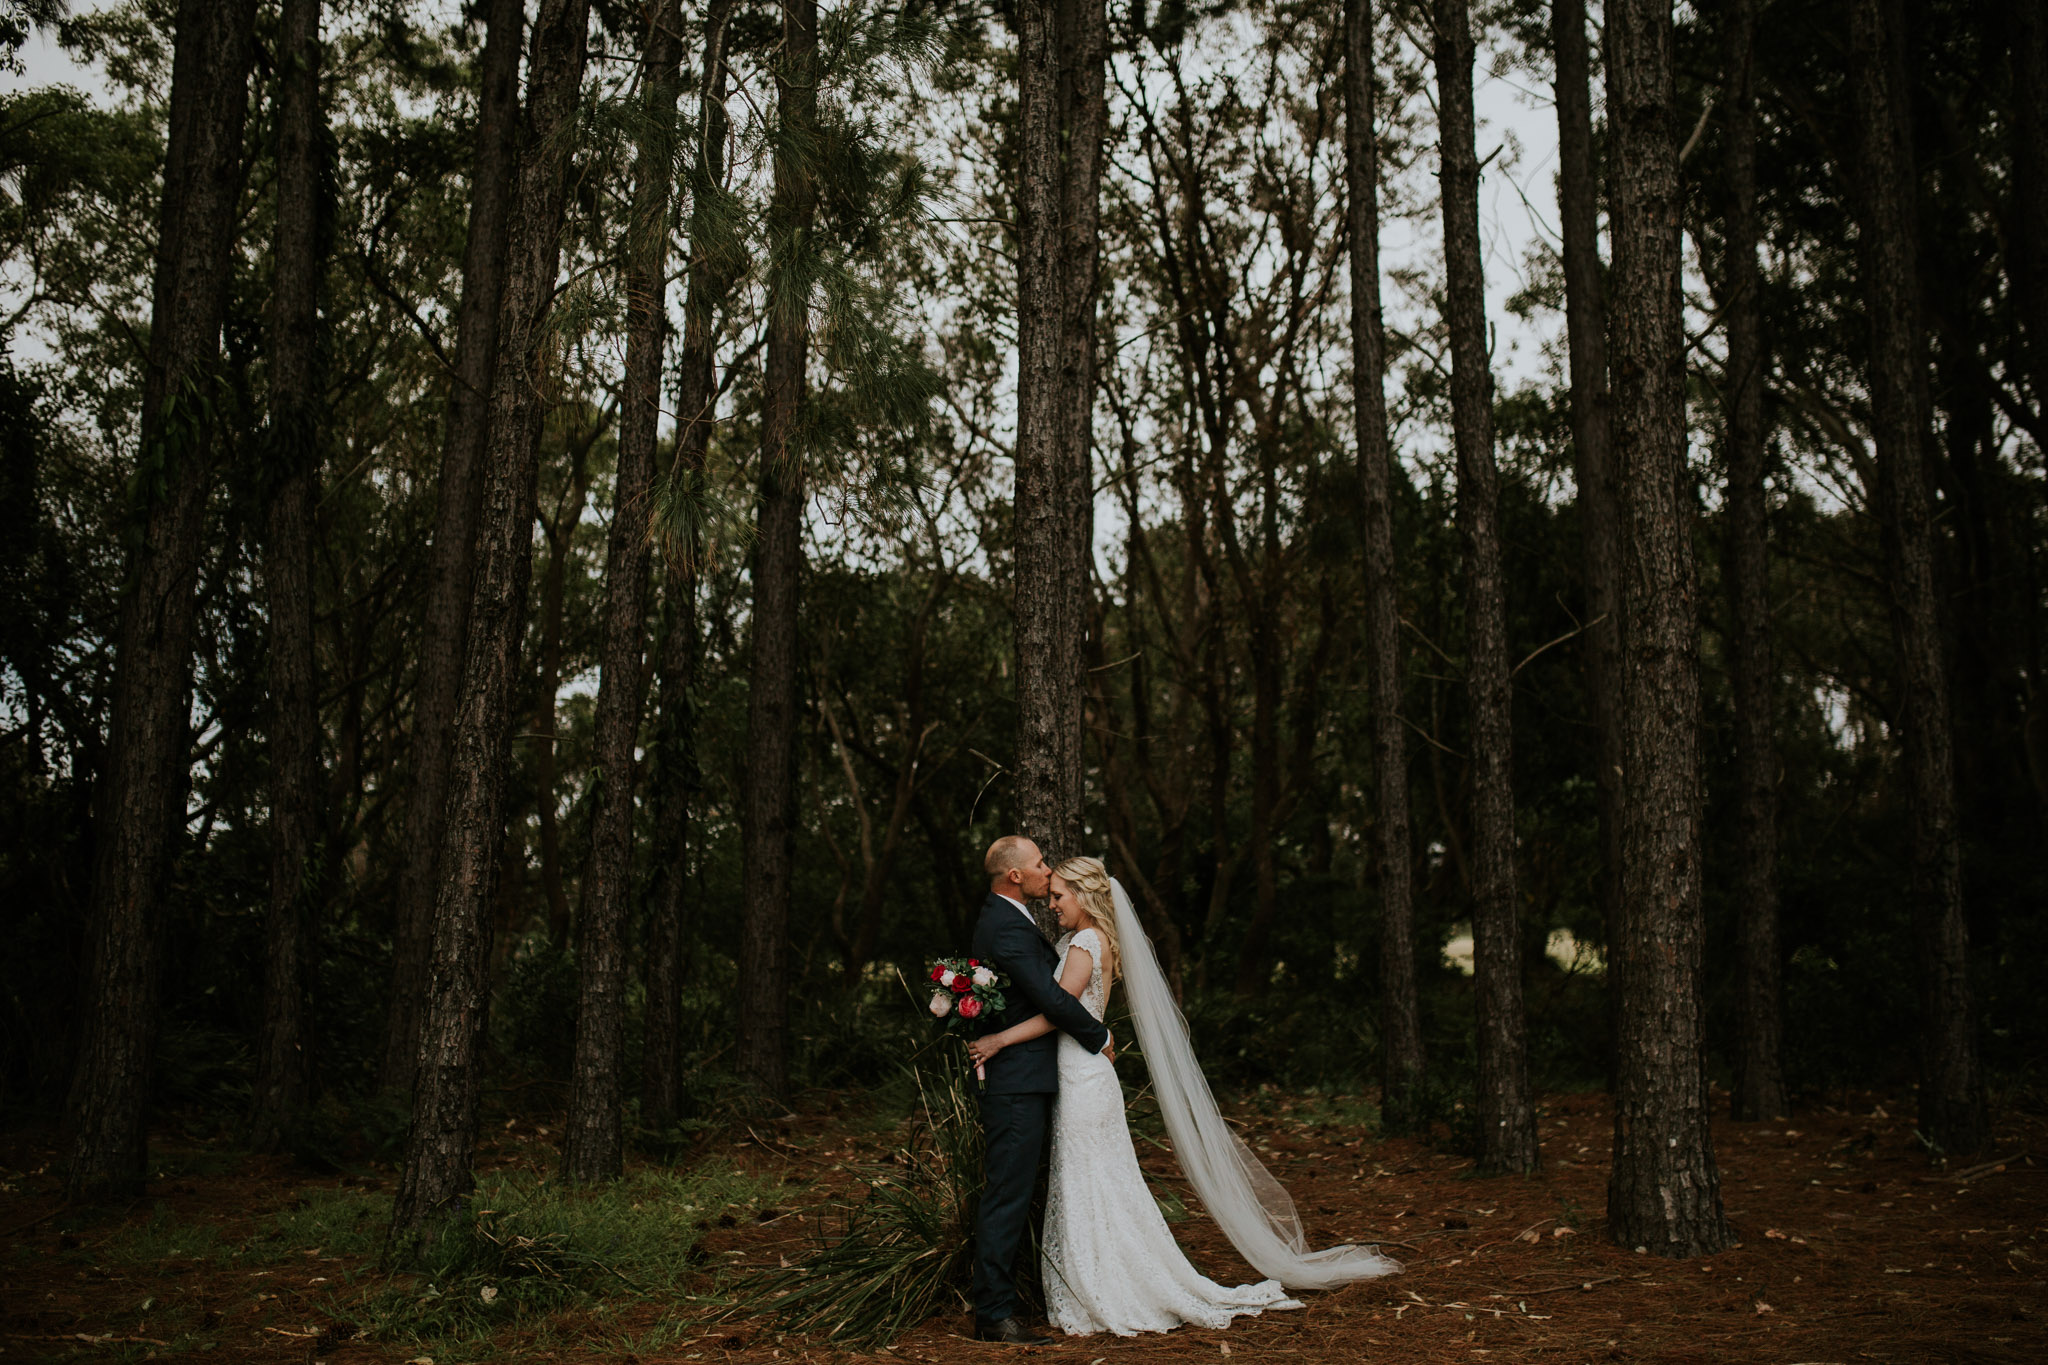 Shanan & Traci_Portkembla Golf Course Wedding-73.jpg